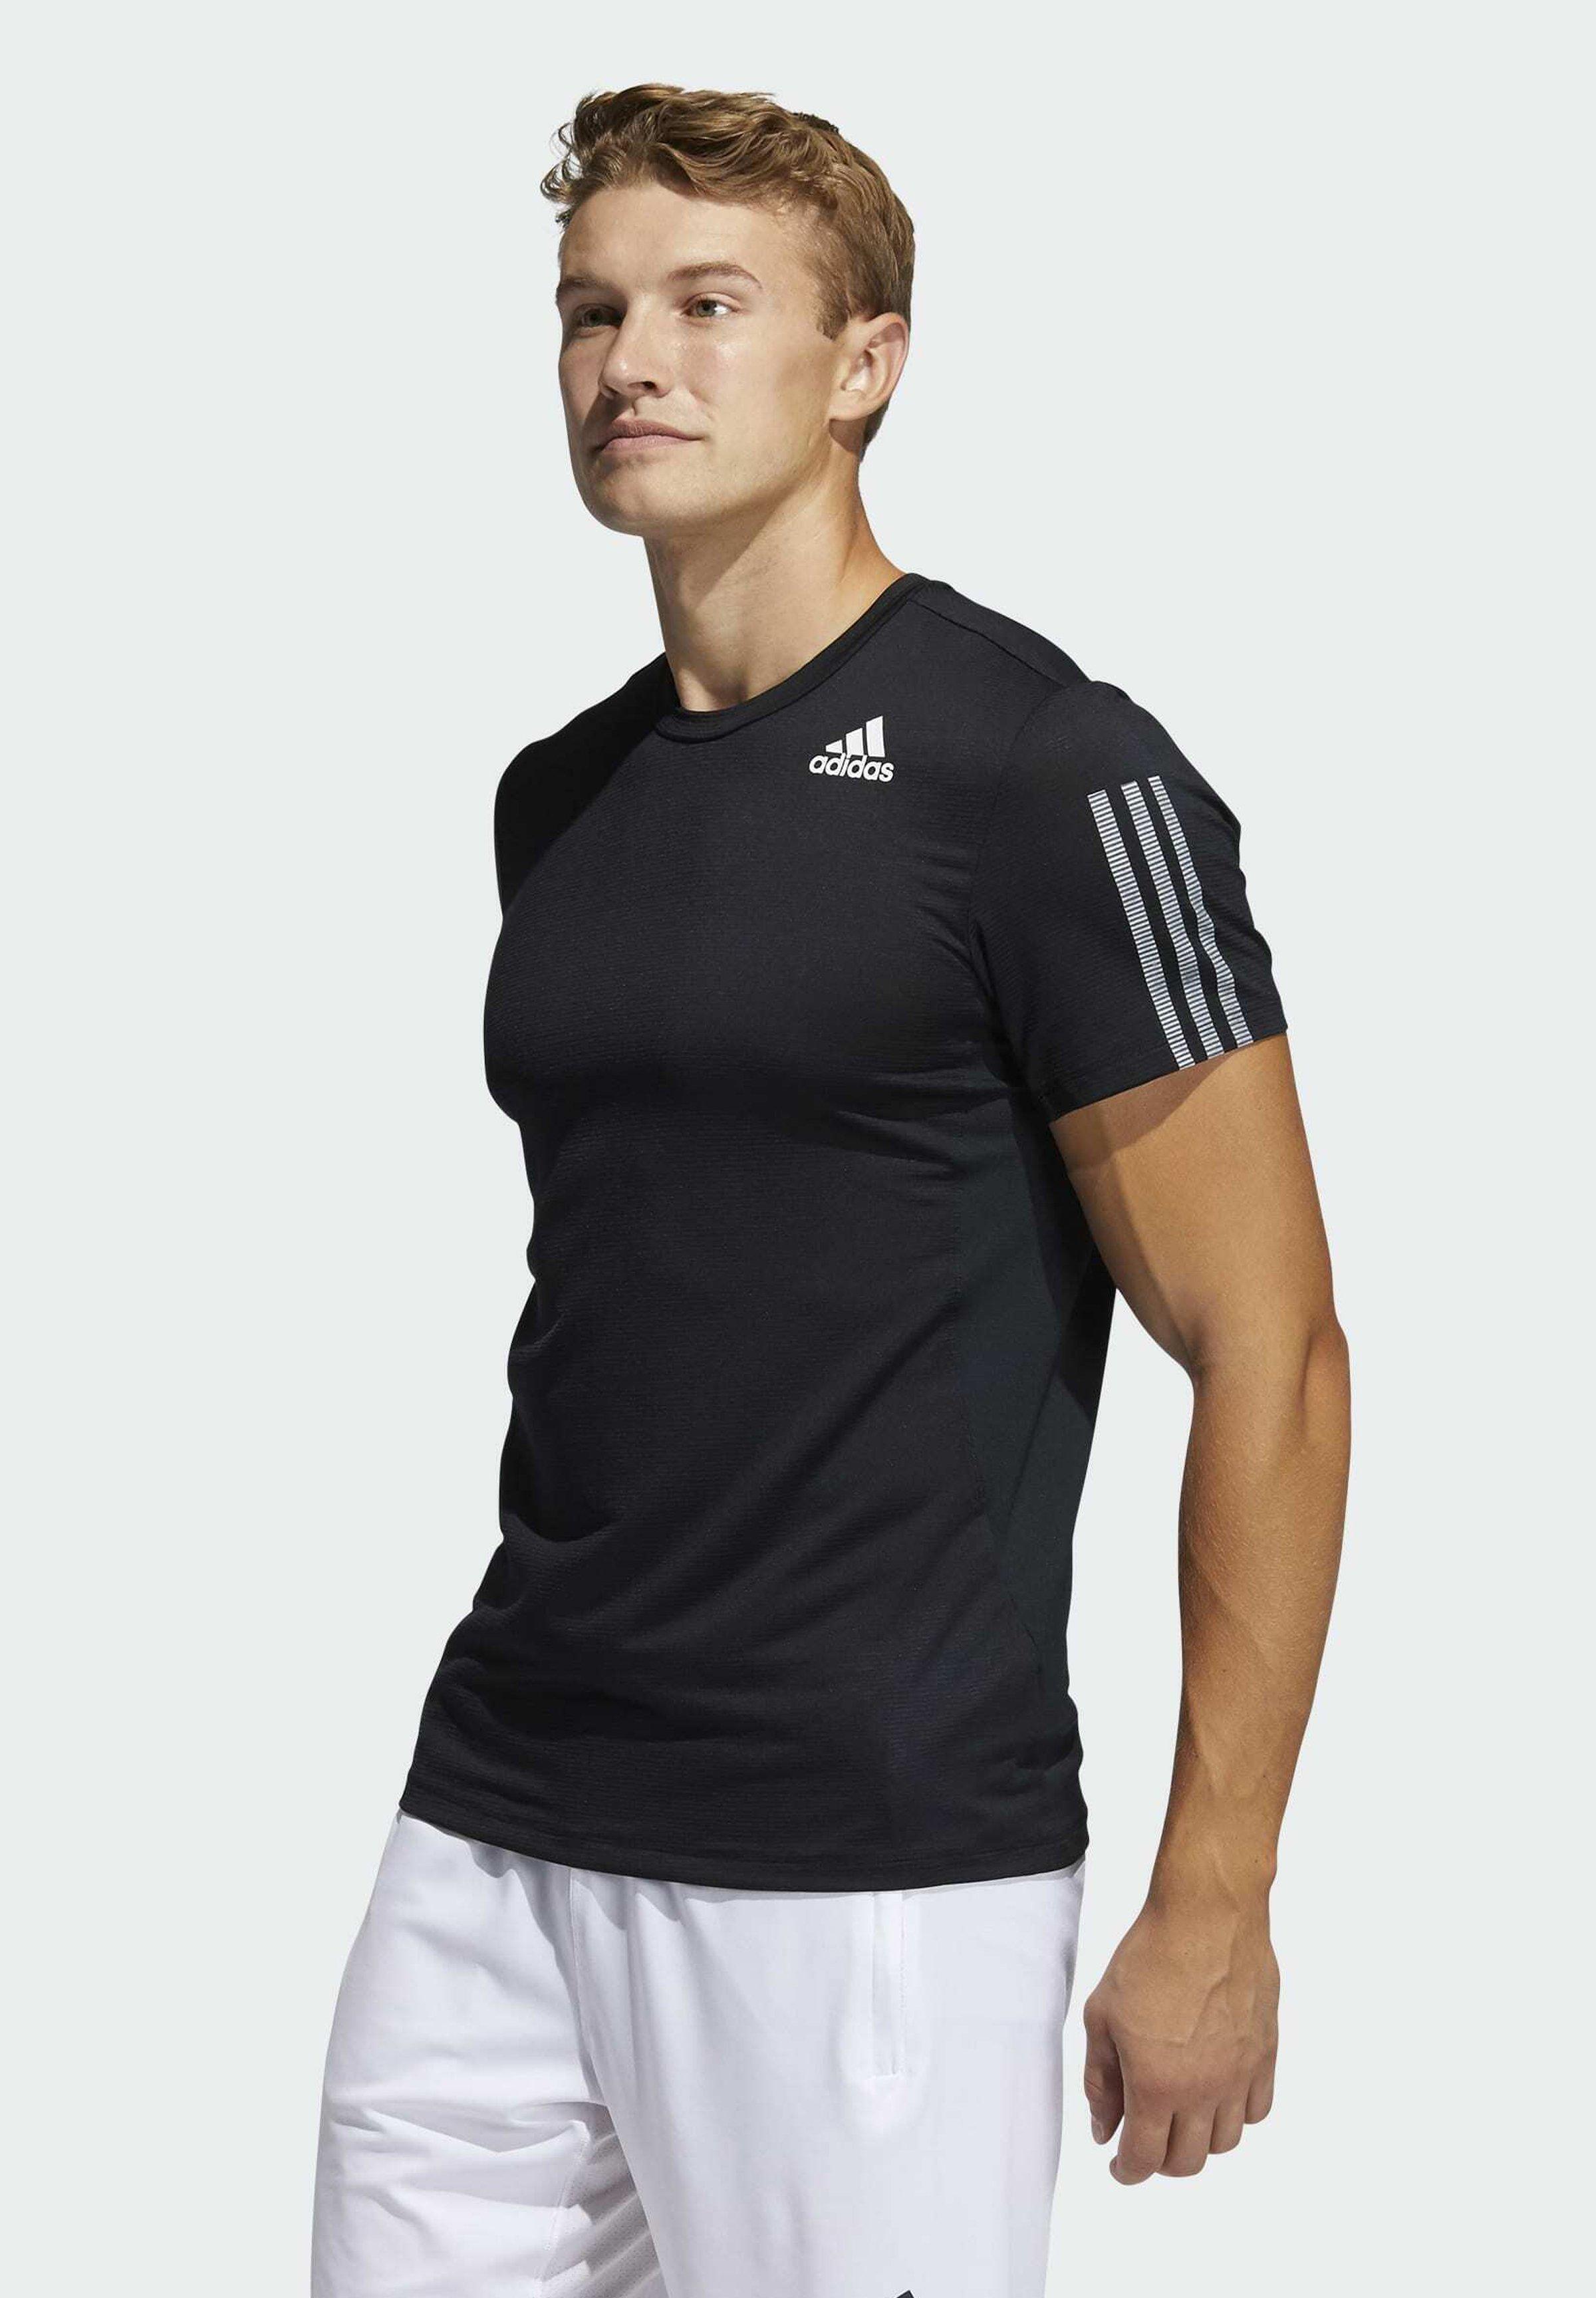 Uomo AERO3S DESIGNED4TRAINING AEROREADY PRIMEBLUE SPORTS T-SHIRT - T-shirt sportiva